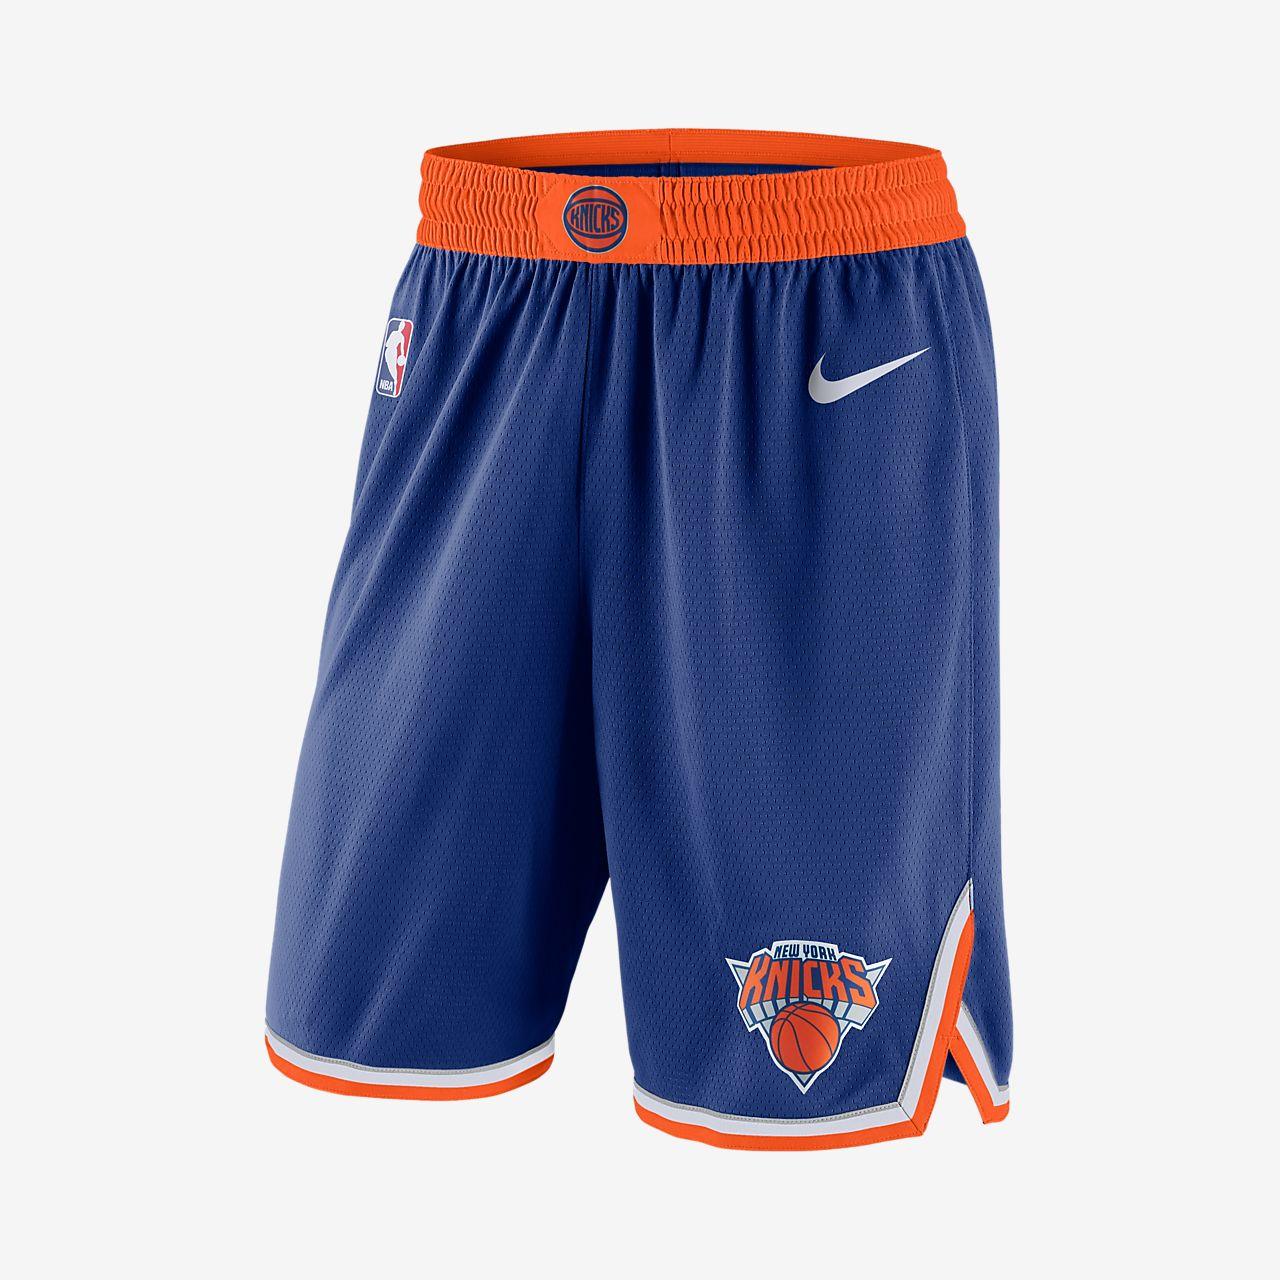 Calções NBA New York Knicks Nike Icon Edition Swingman para homem